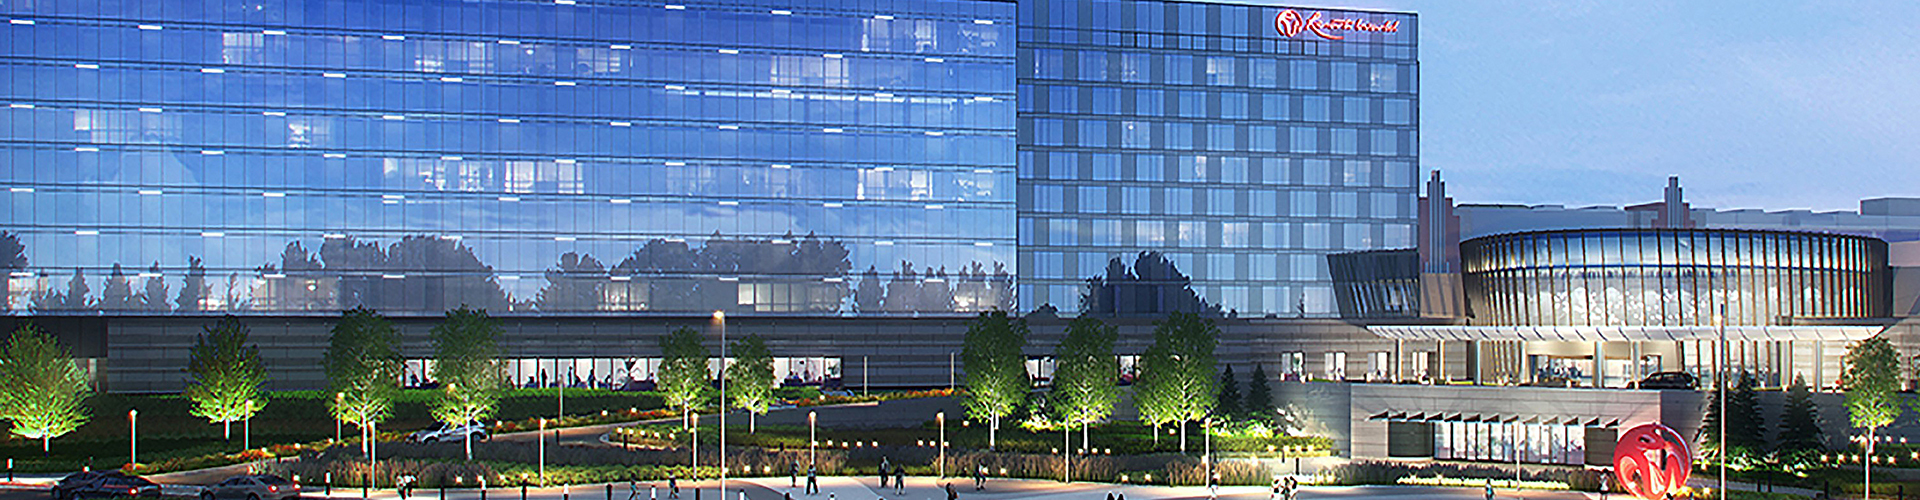 Resorts World NYC Hotel